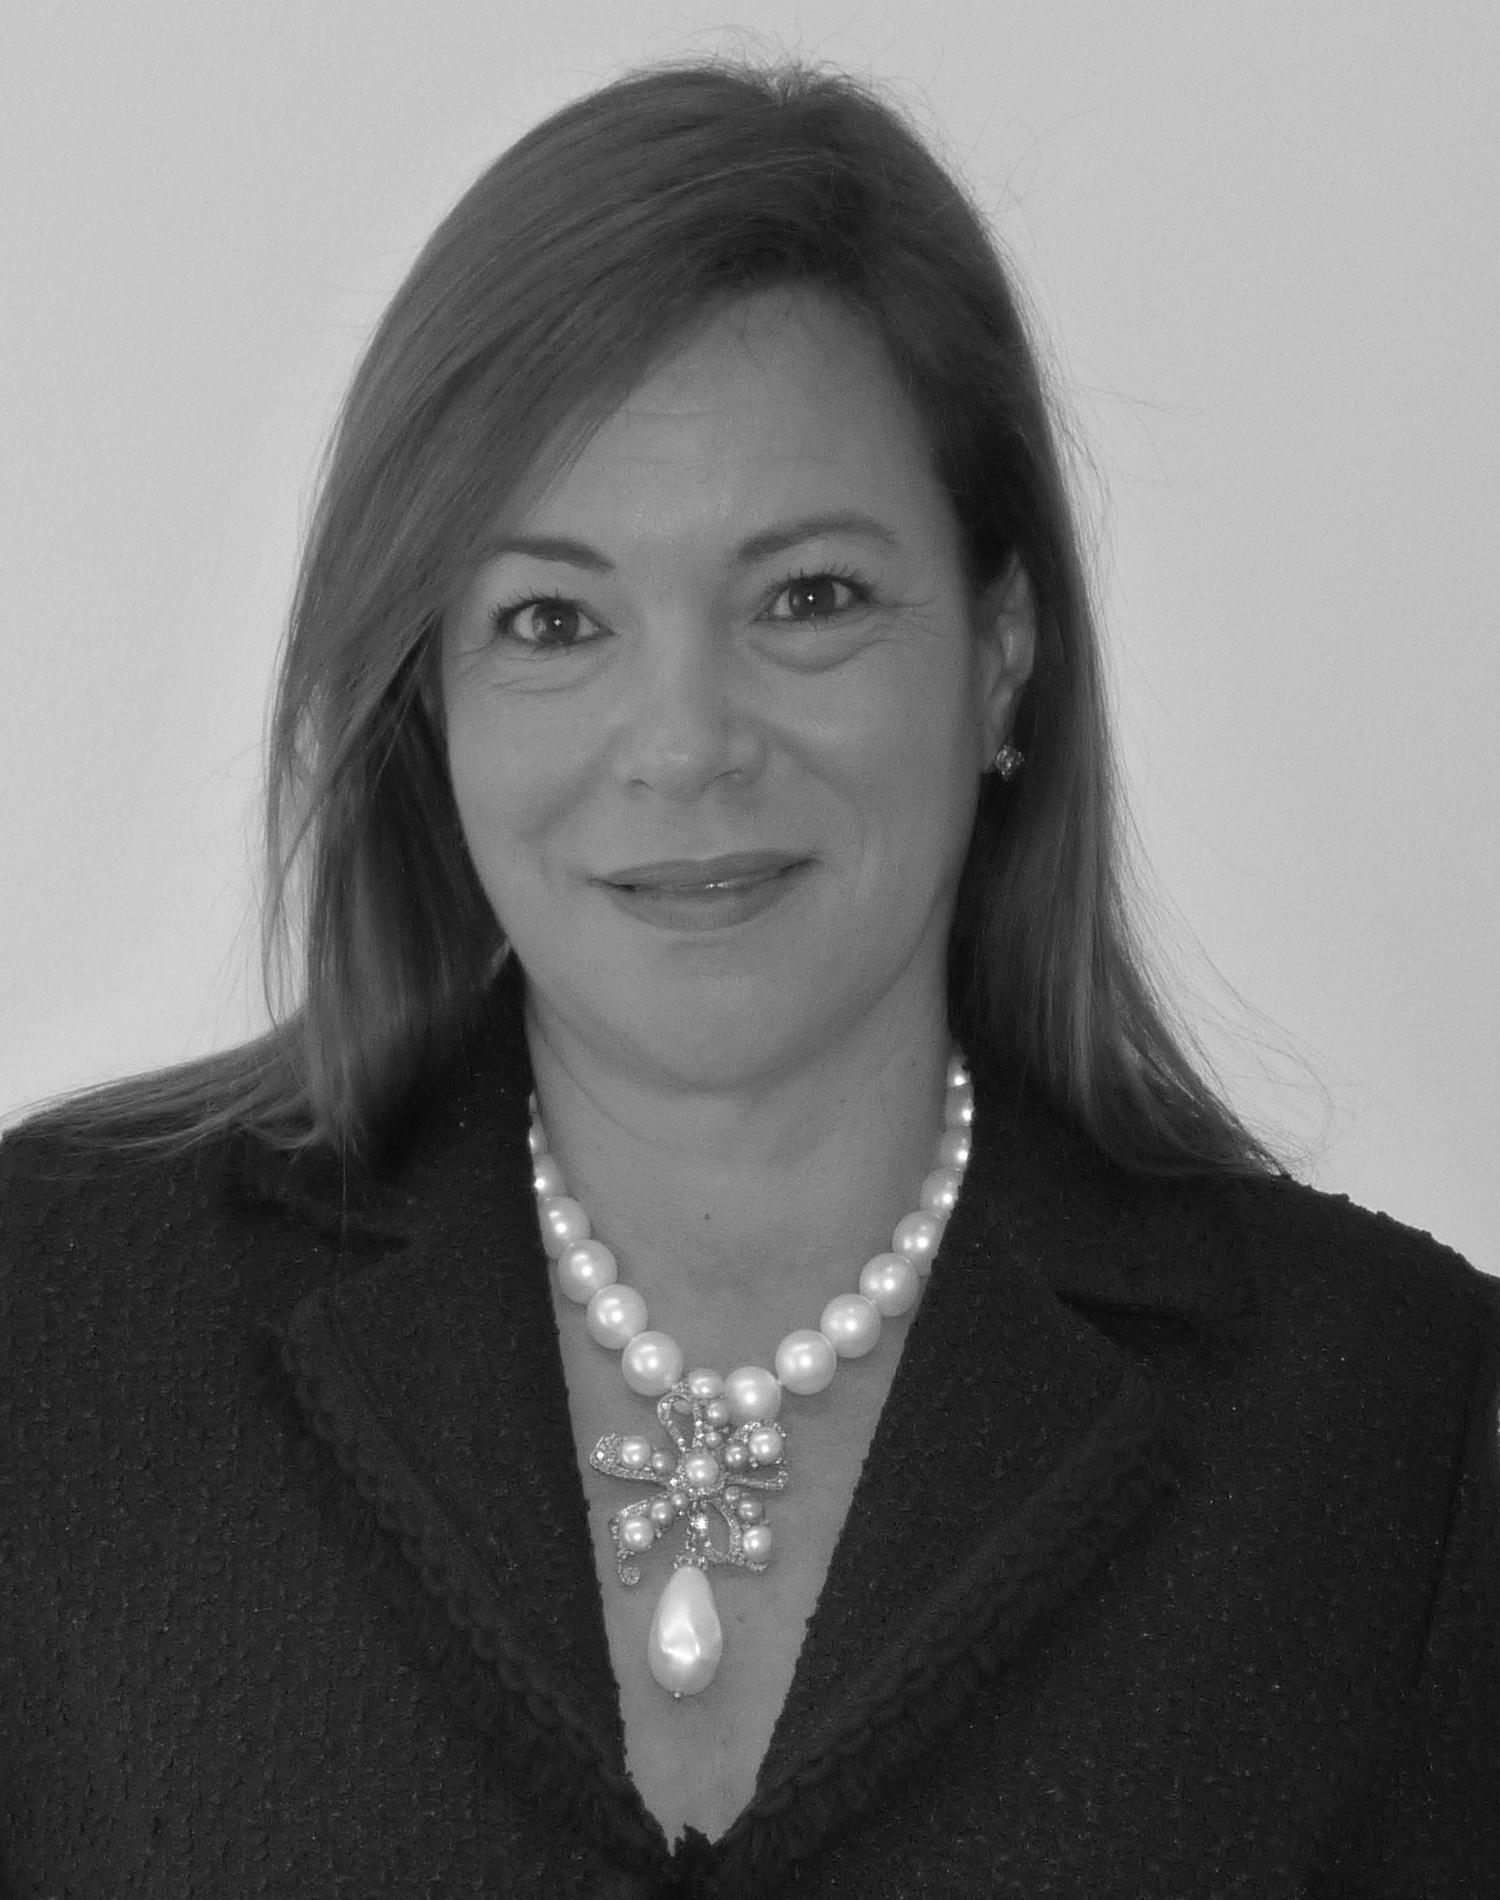 Yolanda Tejeda